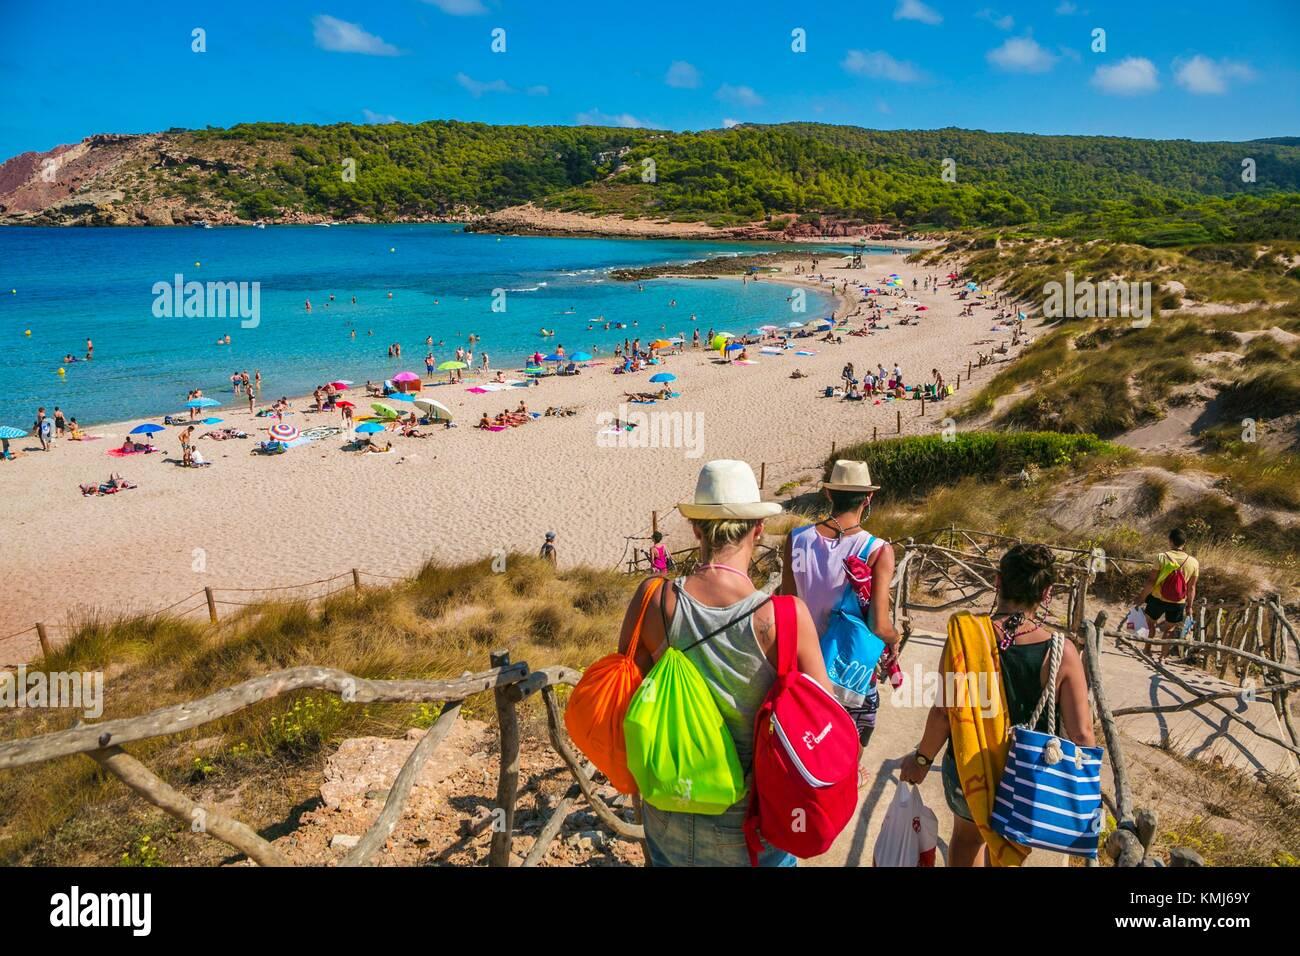 Cala Algaiarens beach. Es Tancats beach. Ciutadella de Menorca Municipality. Minorca. Balearic Islands. Spain - Stock Image